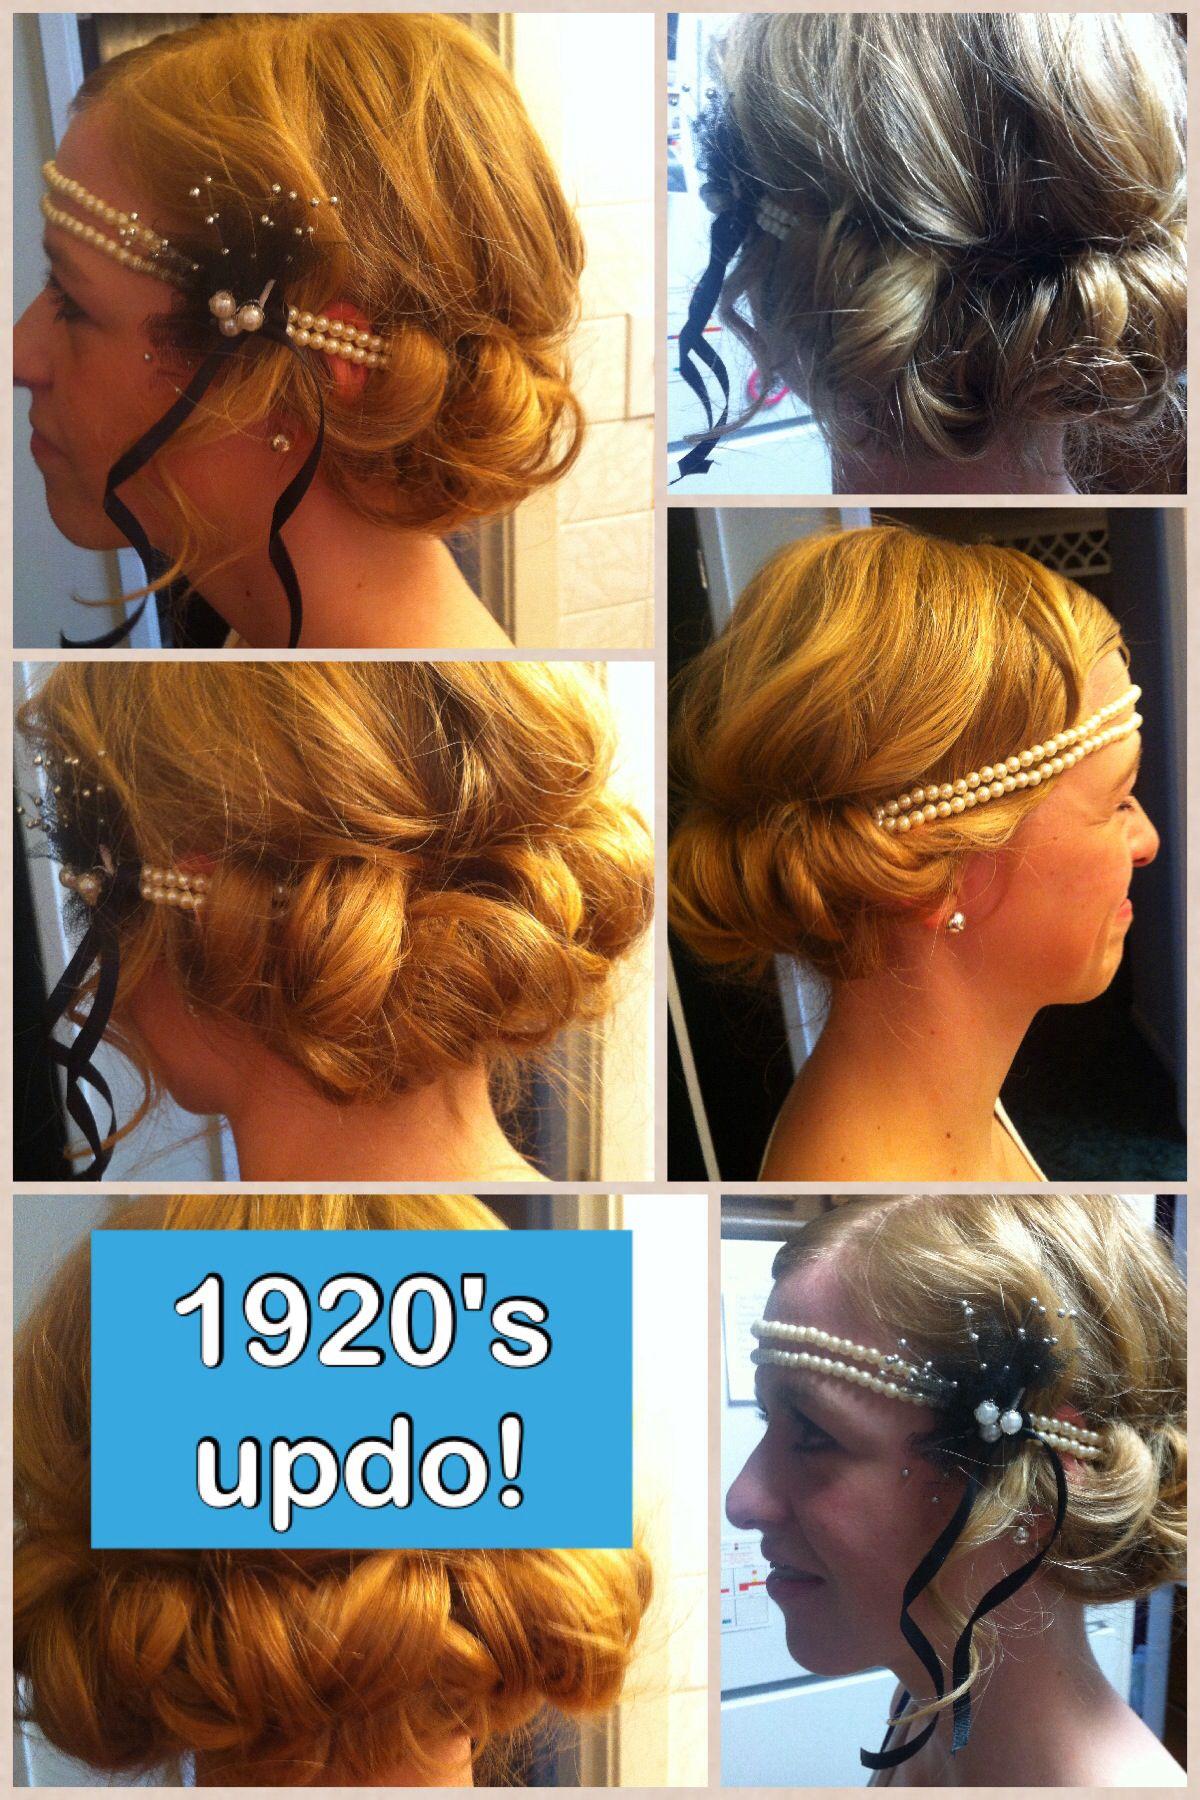 1920's updo :) | Hair styles, Hair, Hair dos